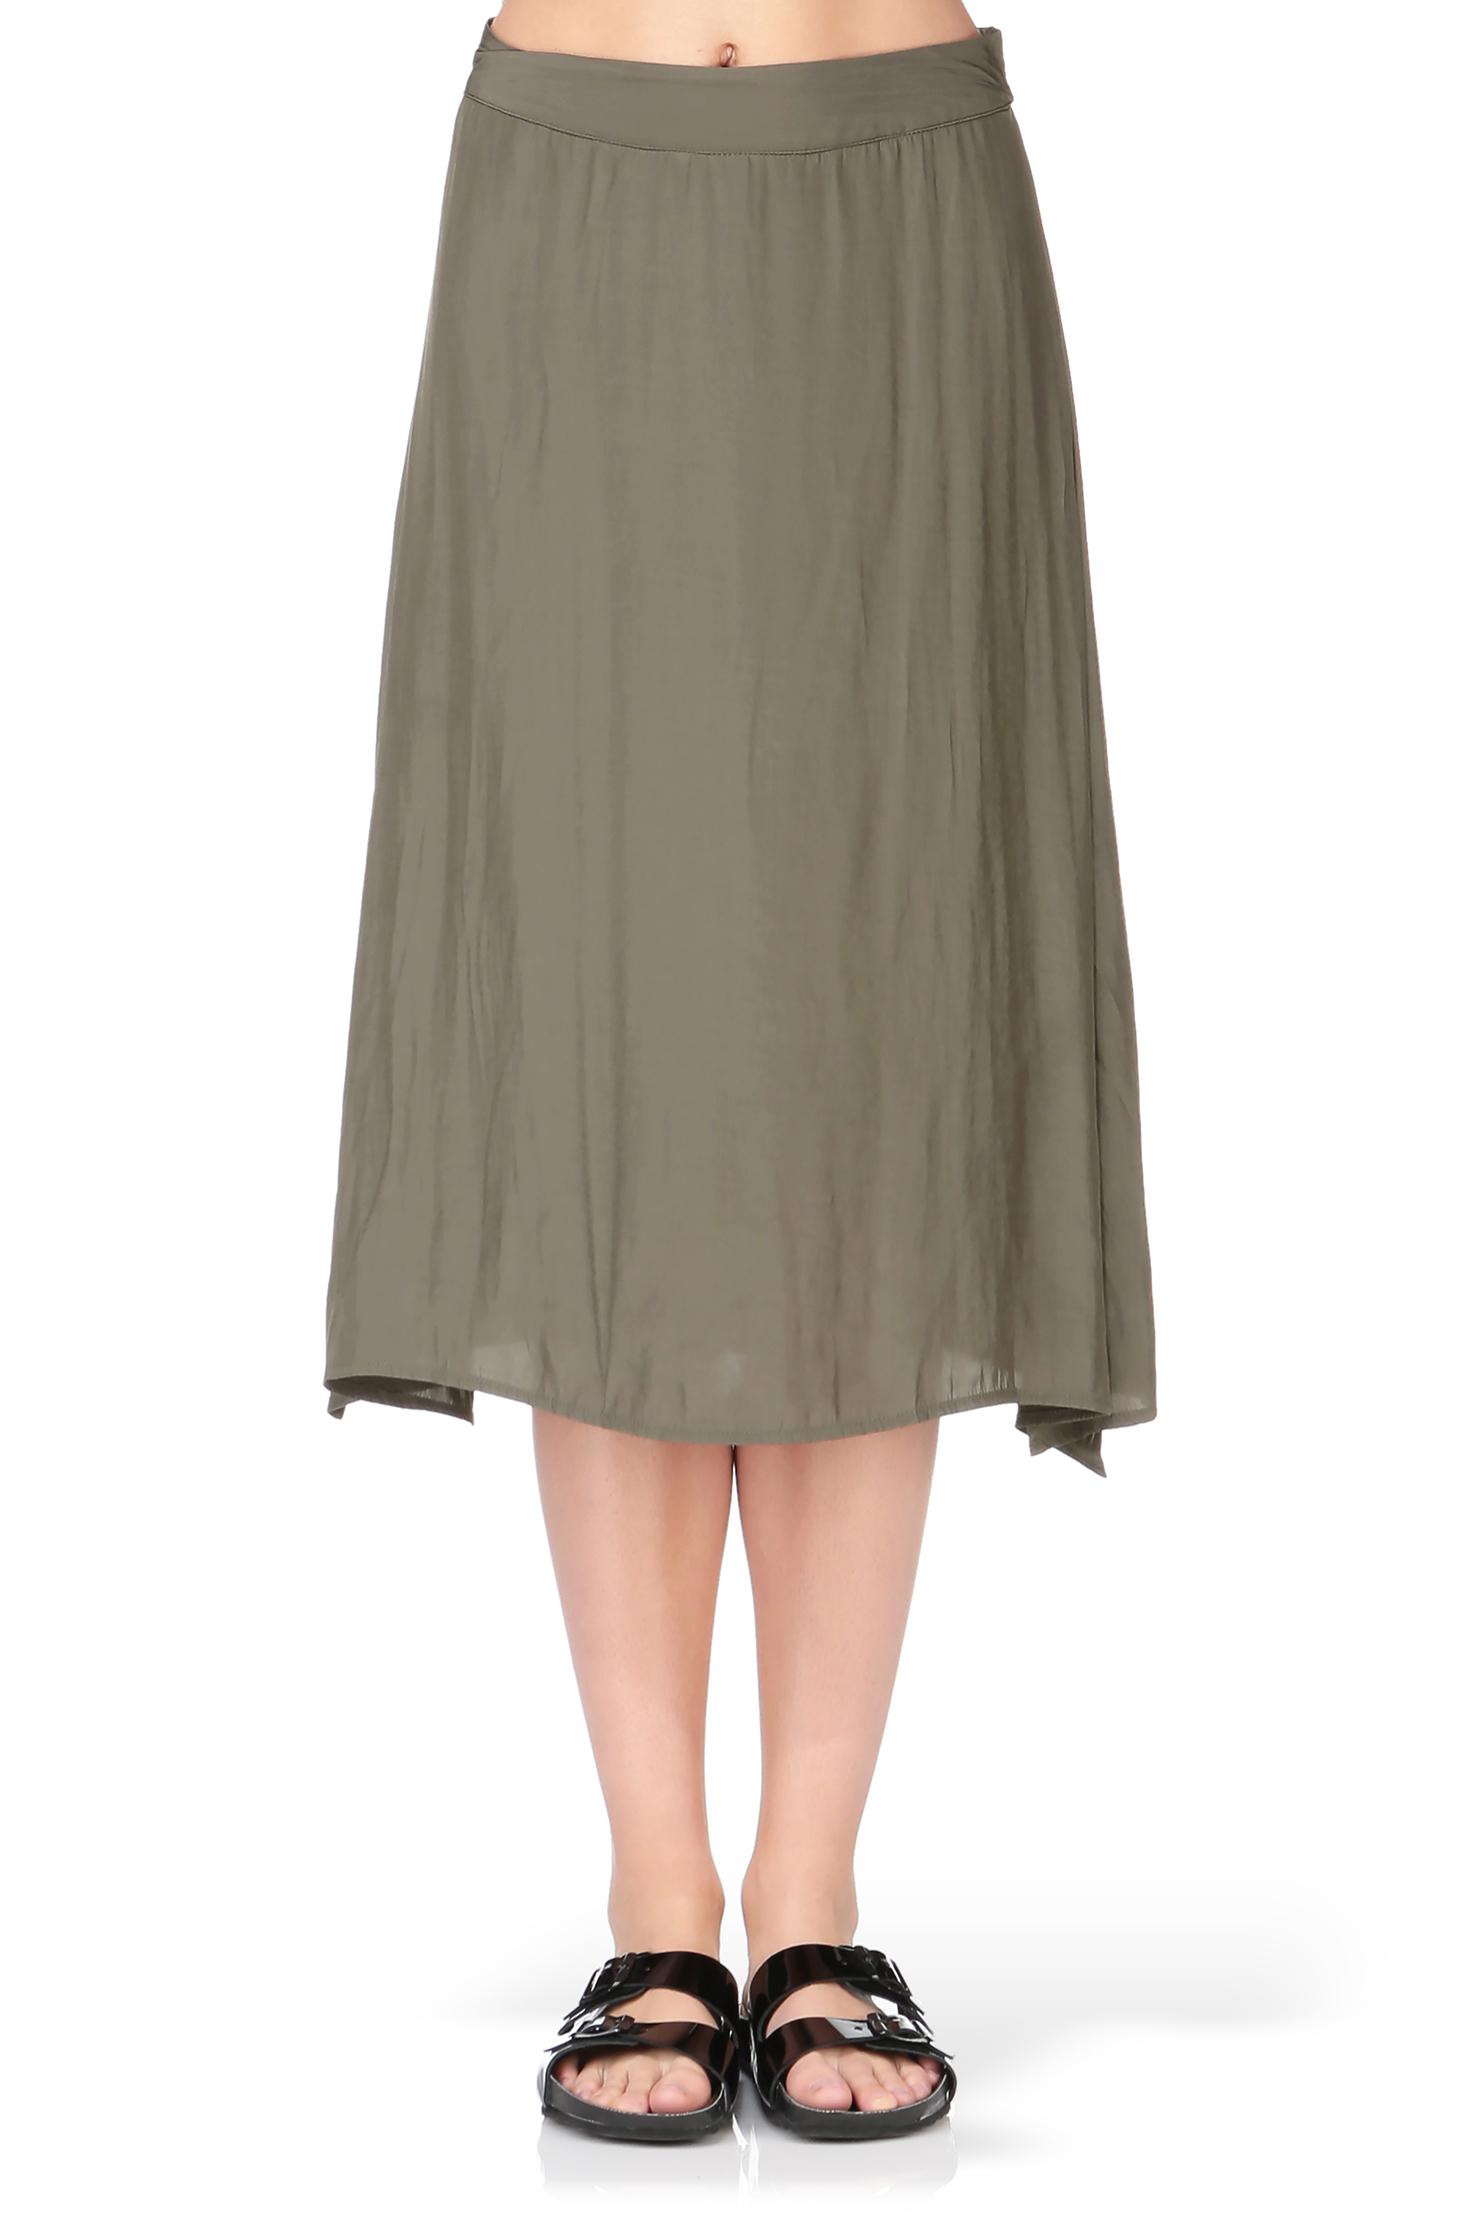 american vintage midi skirt maxi skirt zac182e15 in